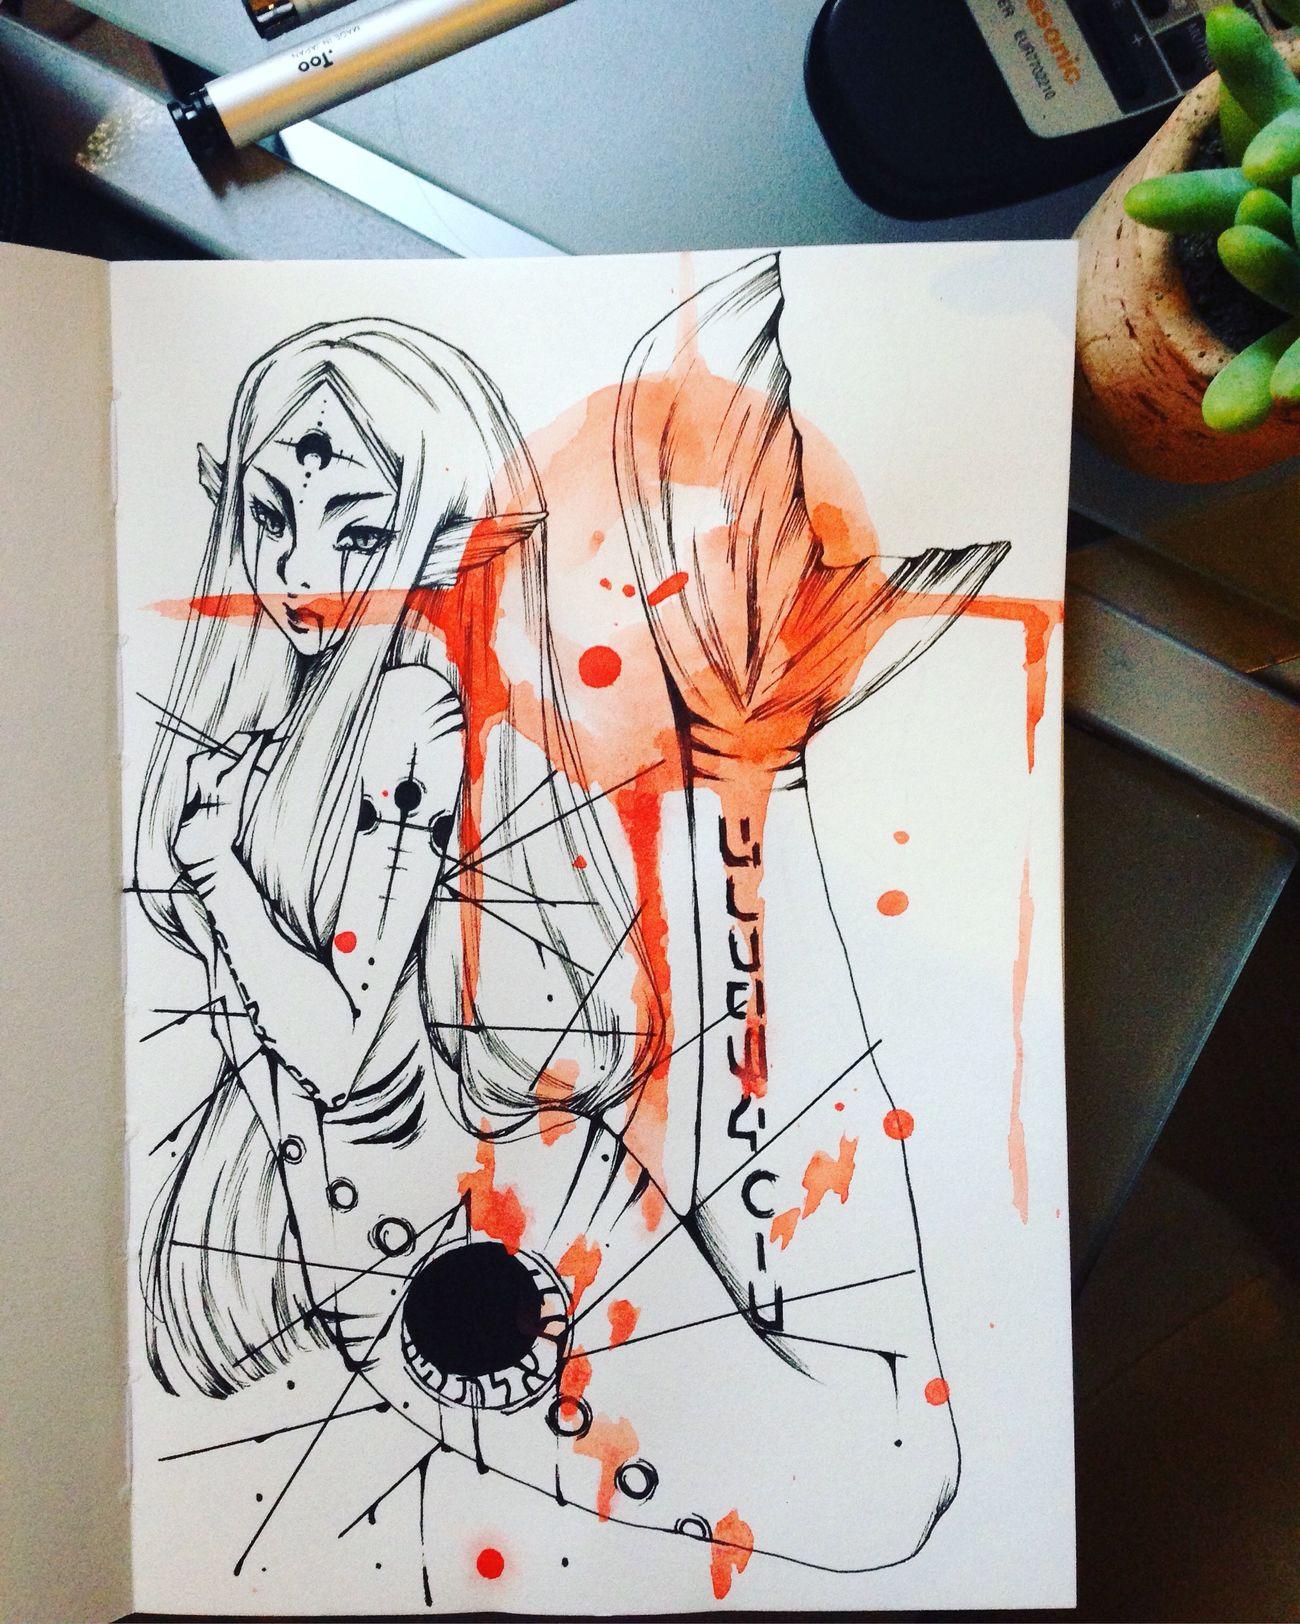 You can support me on patreon now! www.patreon.com/pummelkuh Art MyArt My Art Manga Mermaid Moon Watercolor Beautiful Death Fantasy